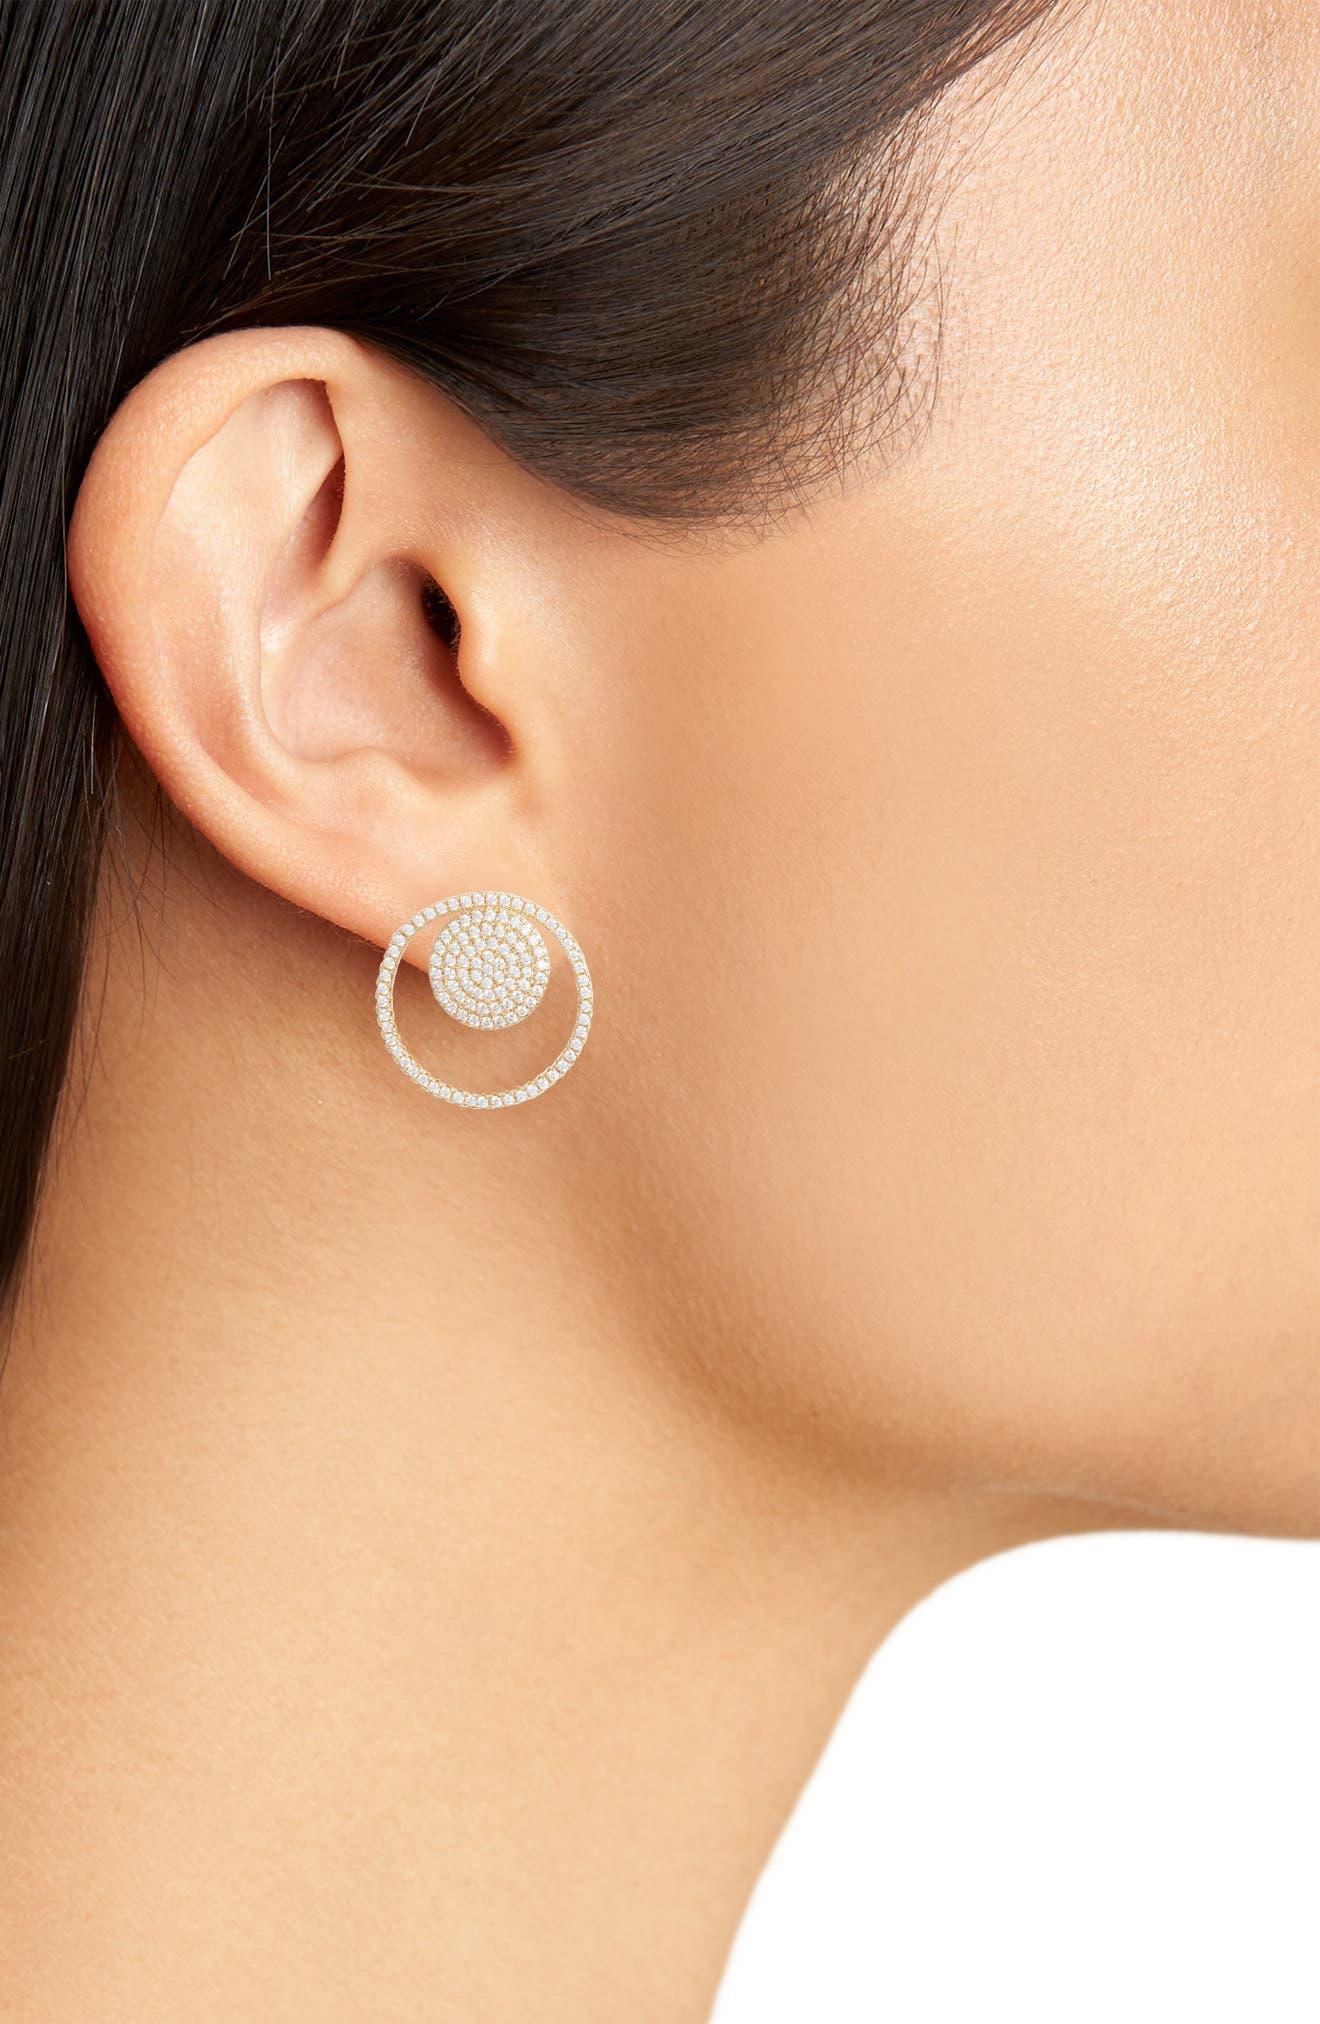 Pavé Spheres Frontal Hoop Earrings,                             Alternate thumbnail 2, color,                             CLEAR/ GOLD